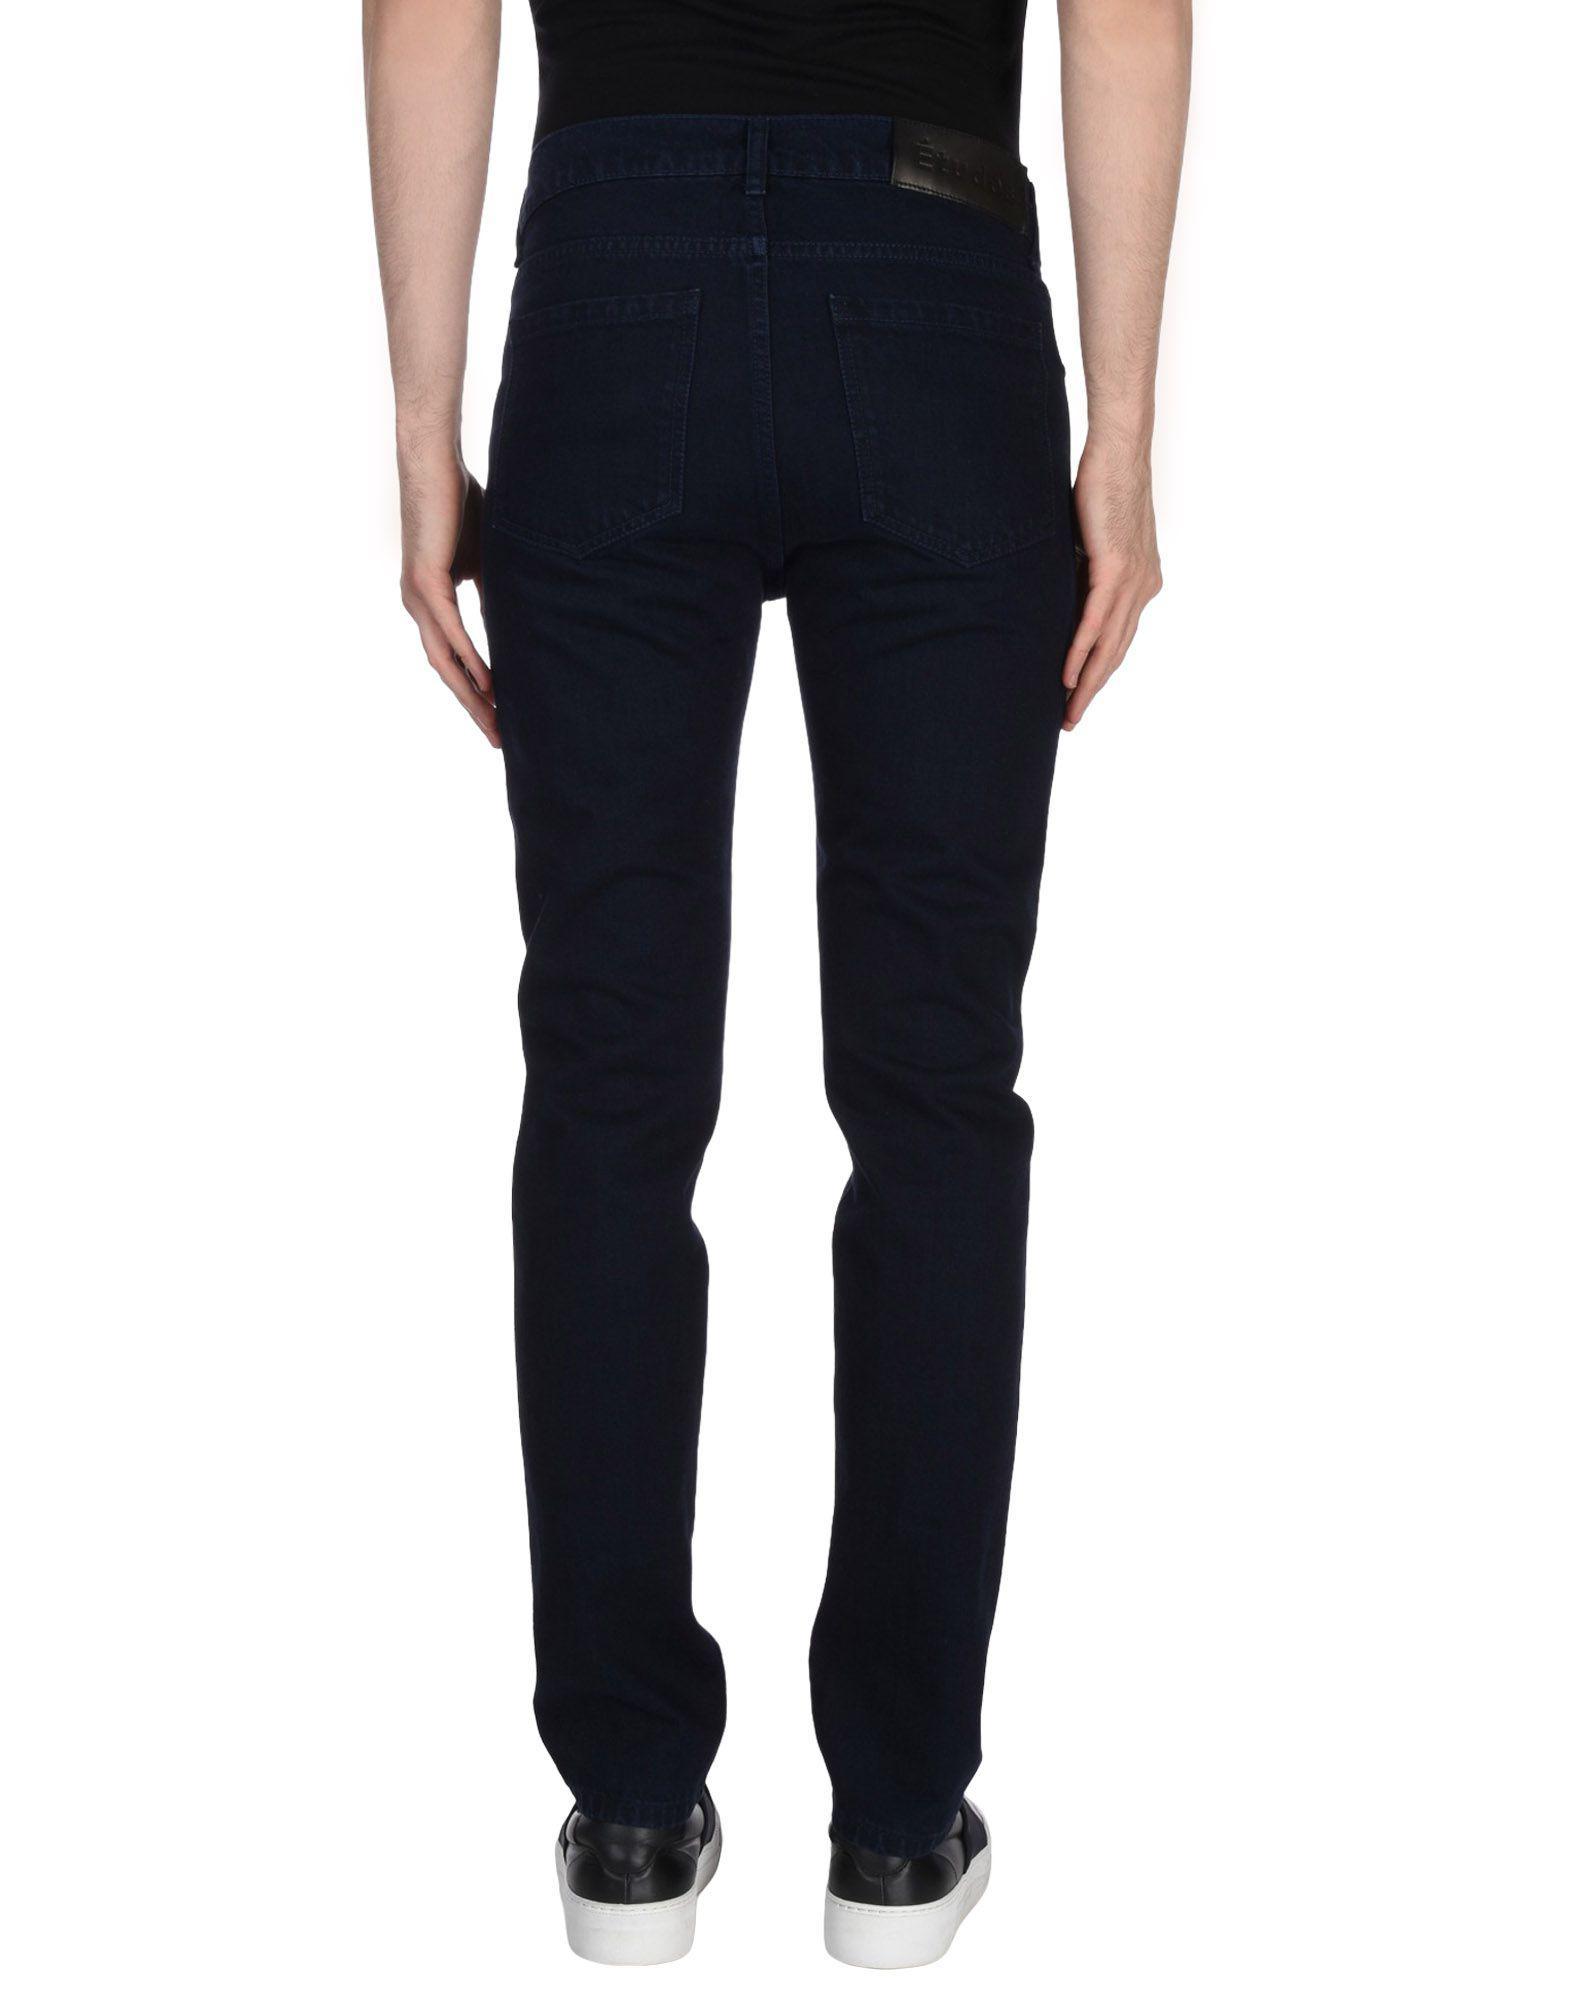 Etudes Studio Denim Trousers in Blue for Men